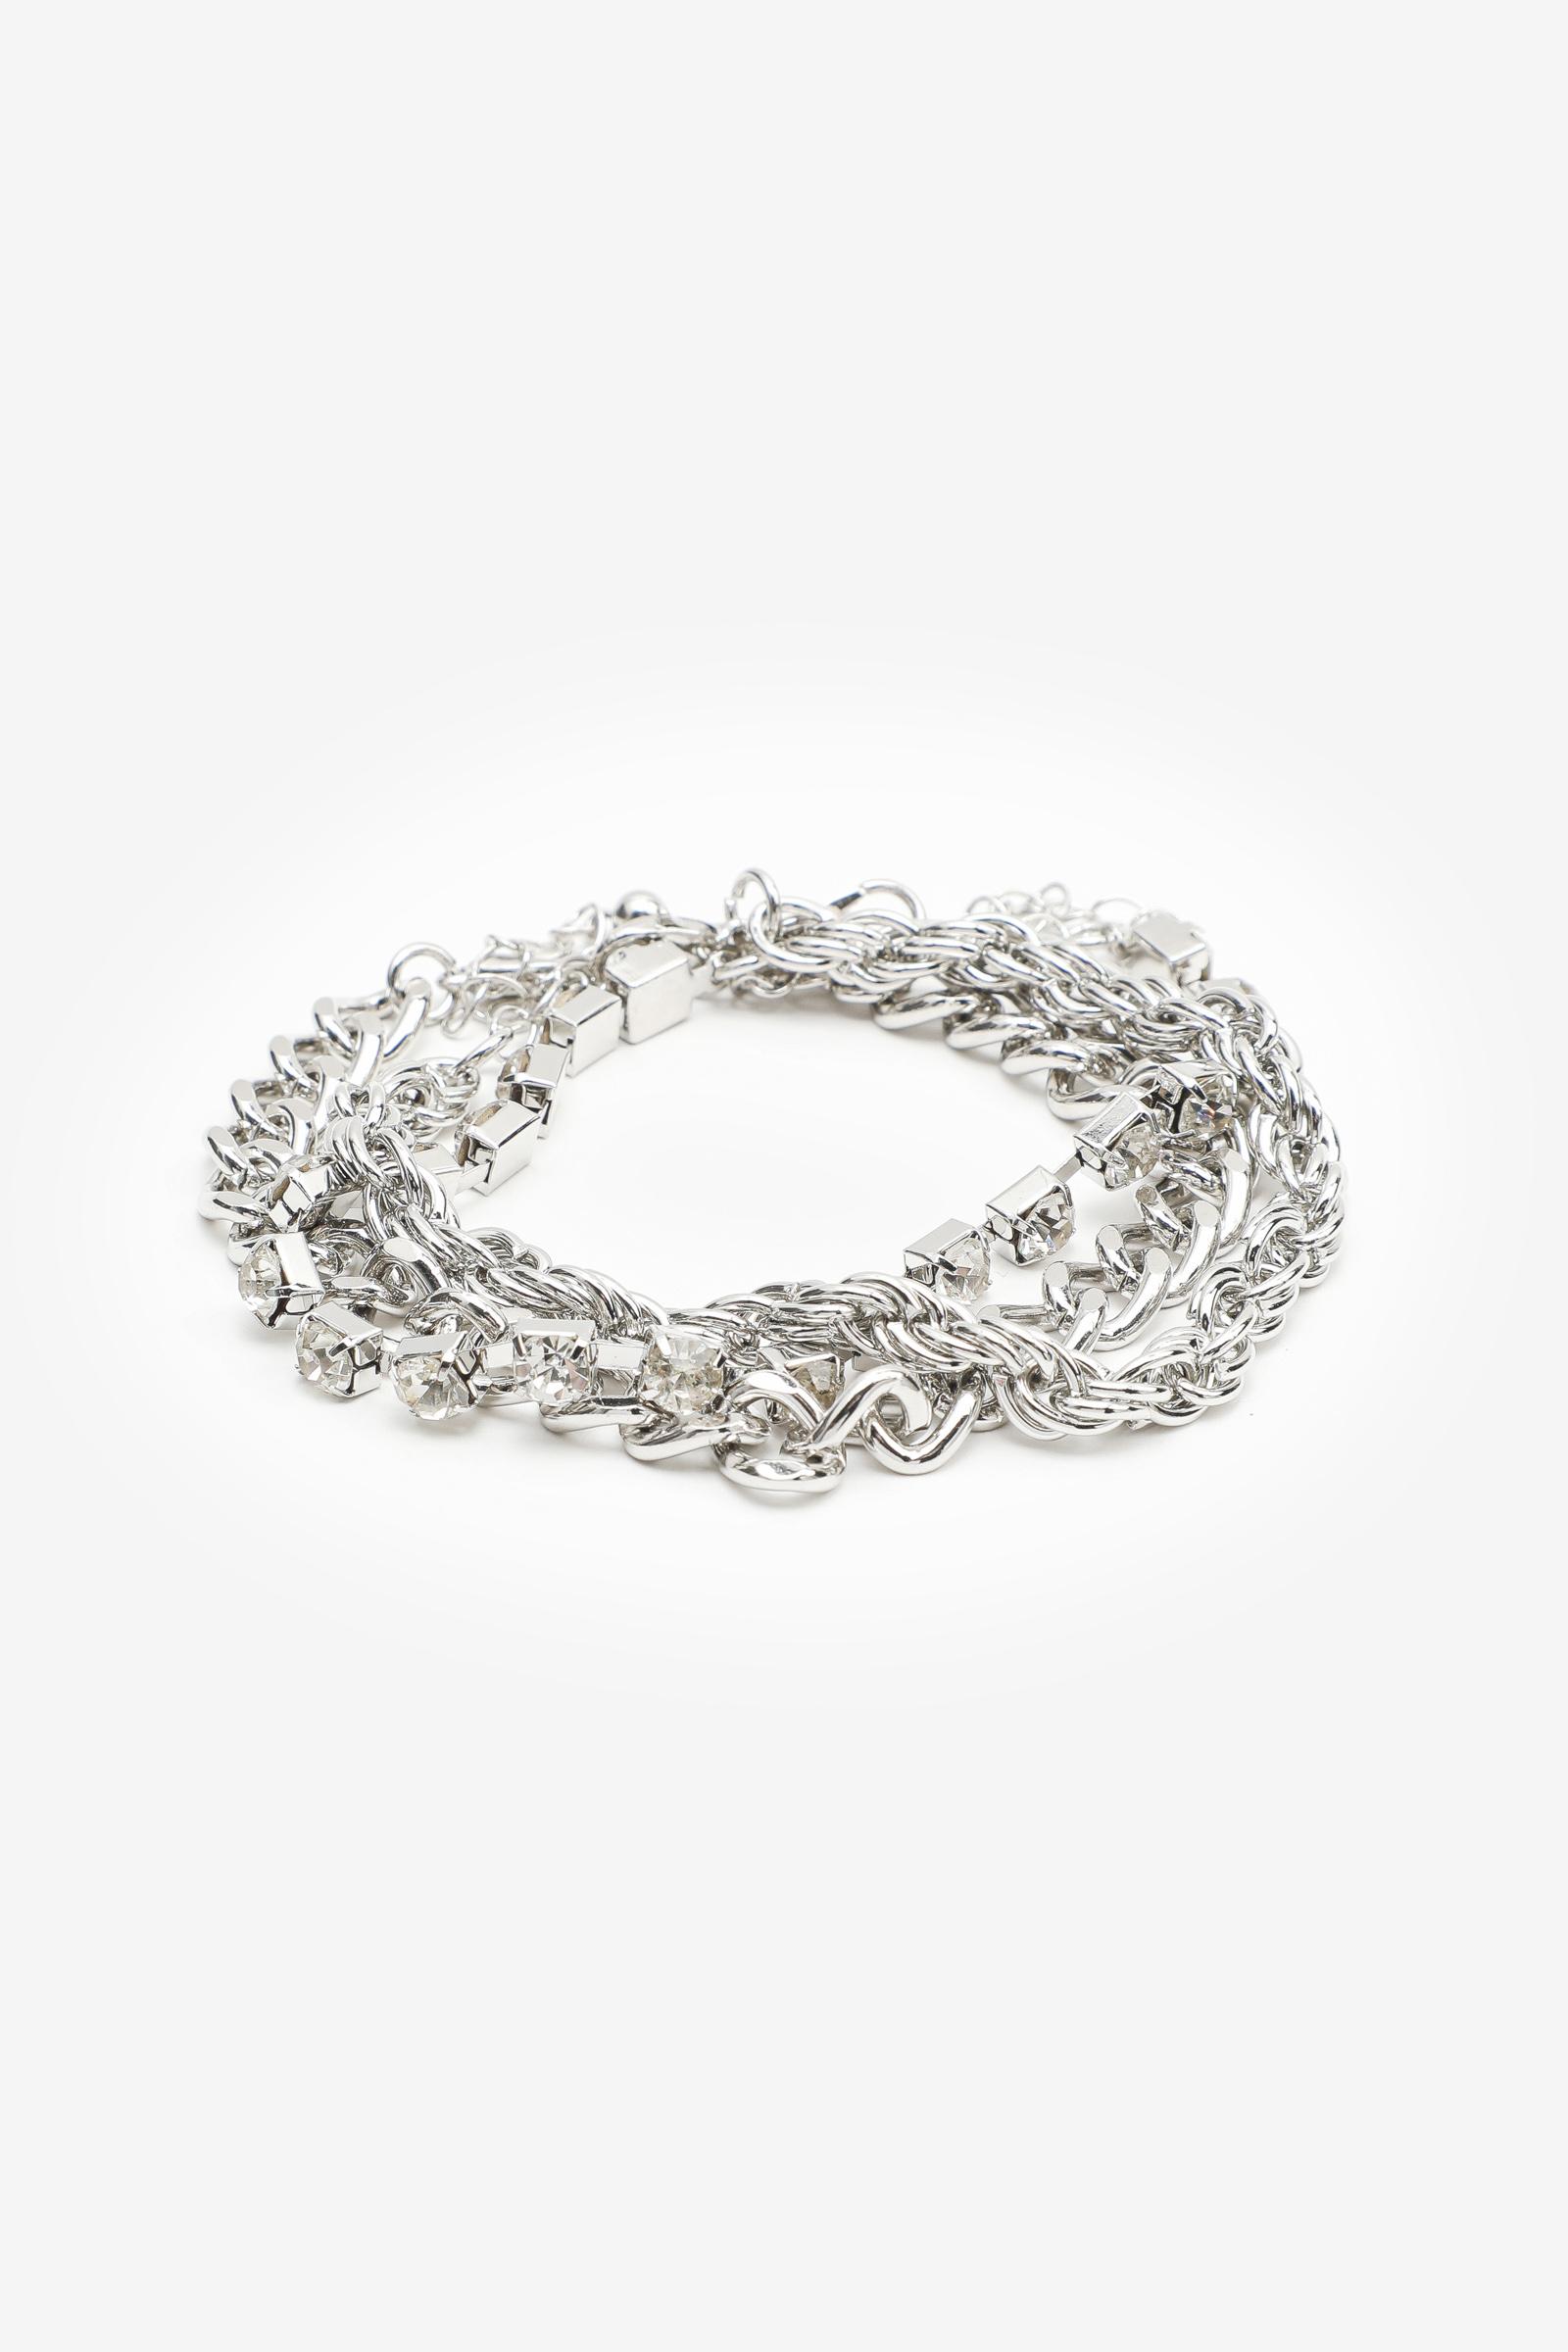 Pack of Chain Bracelets